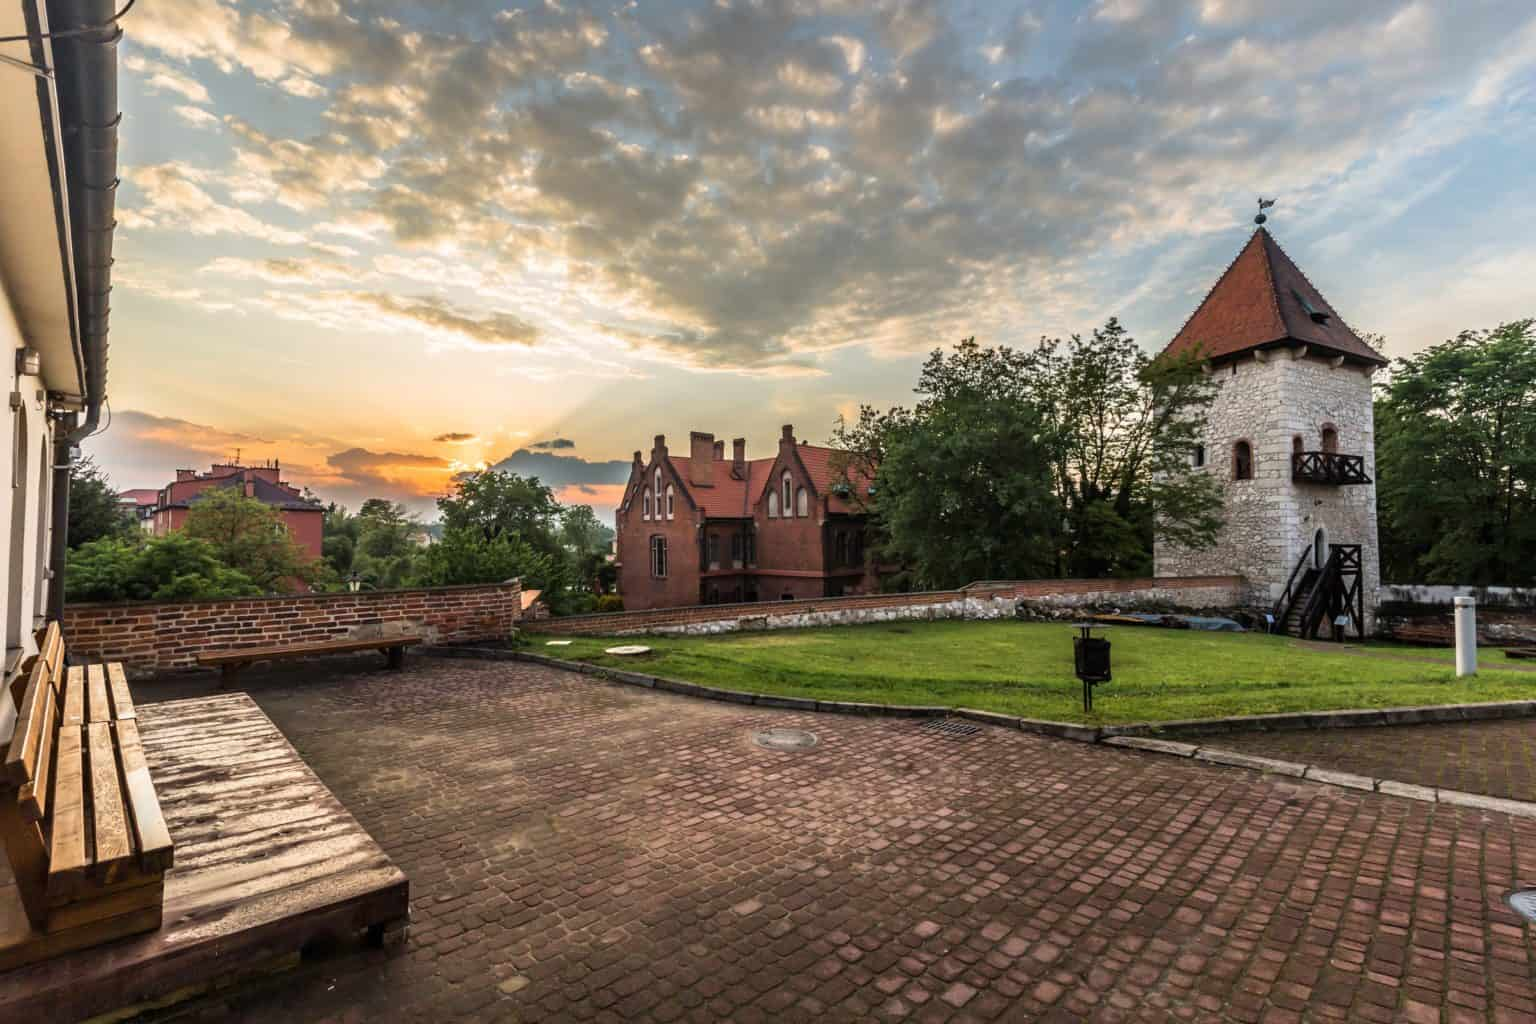 Wieliczka walking tour